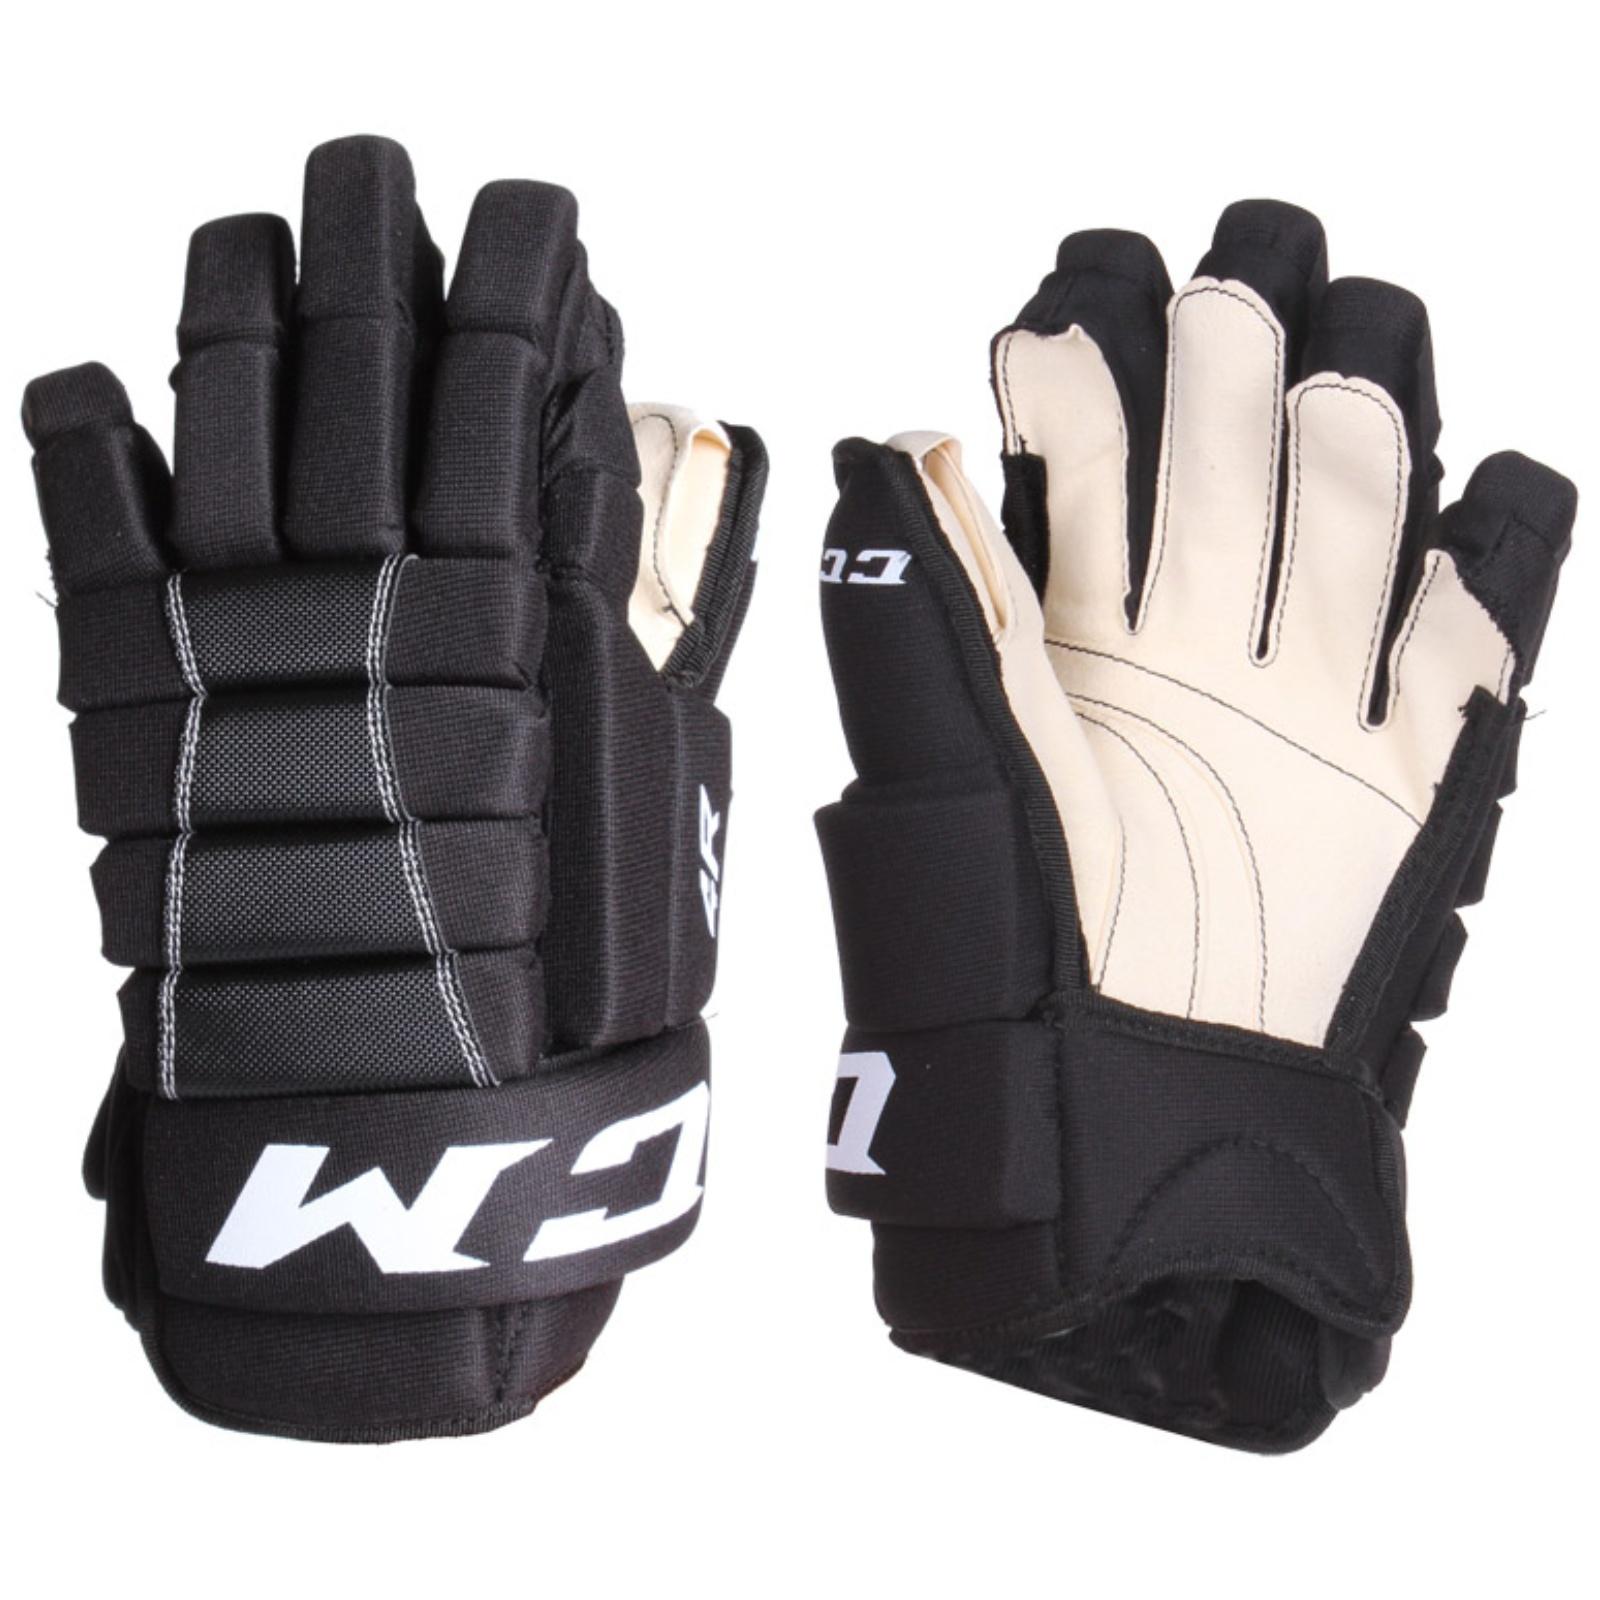 "Hokejové rukavice CCM 4R III senior, černo-bílé vel. 13"""